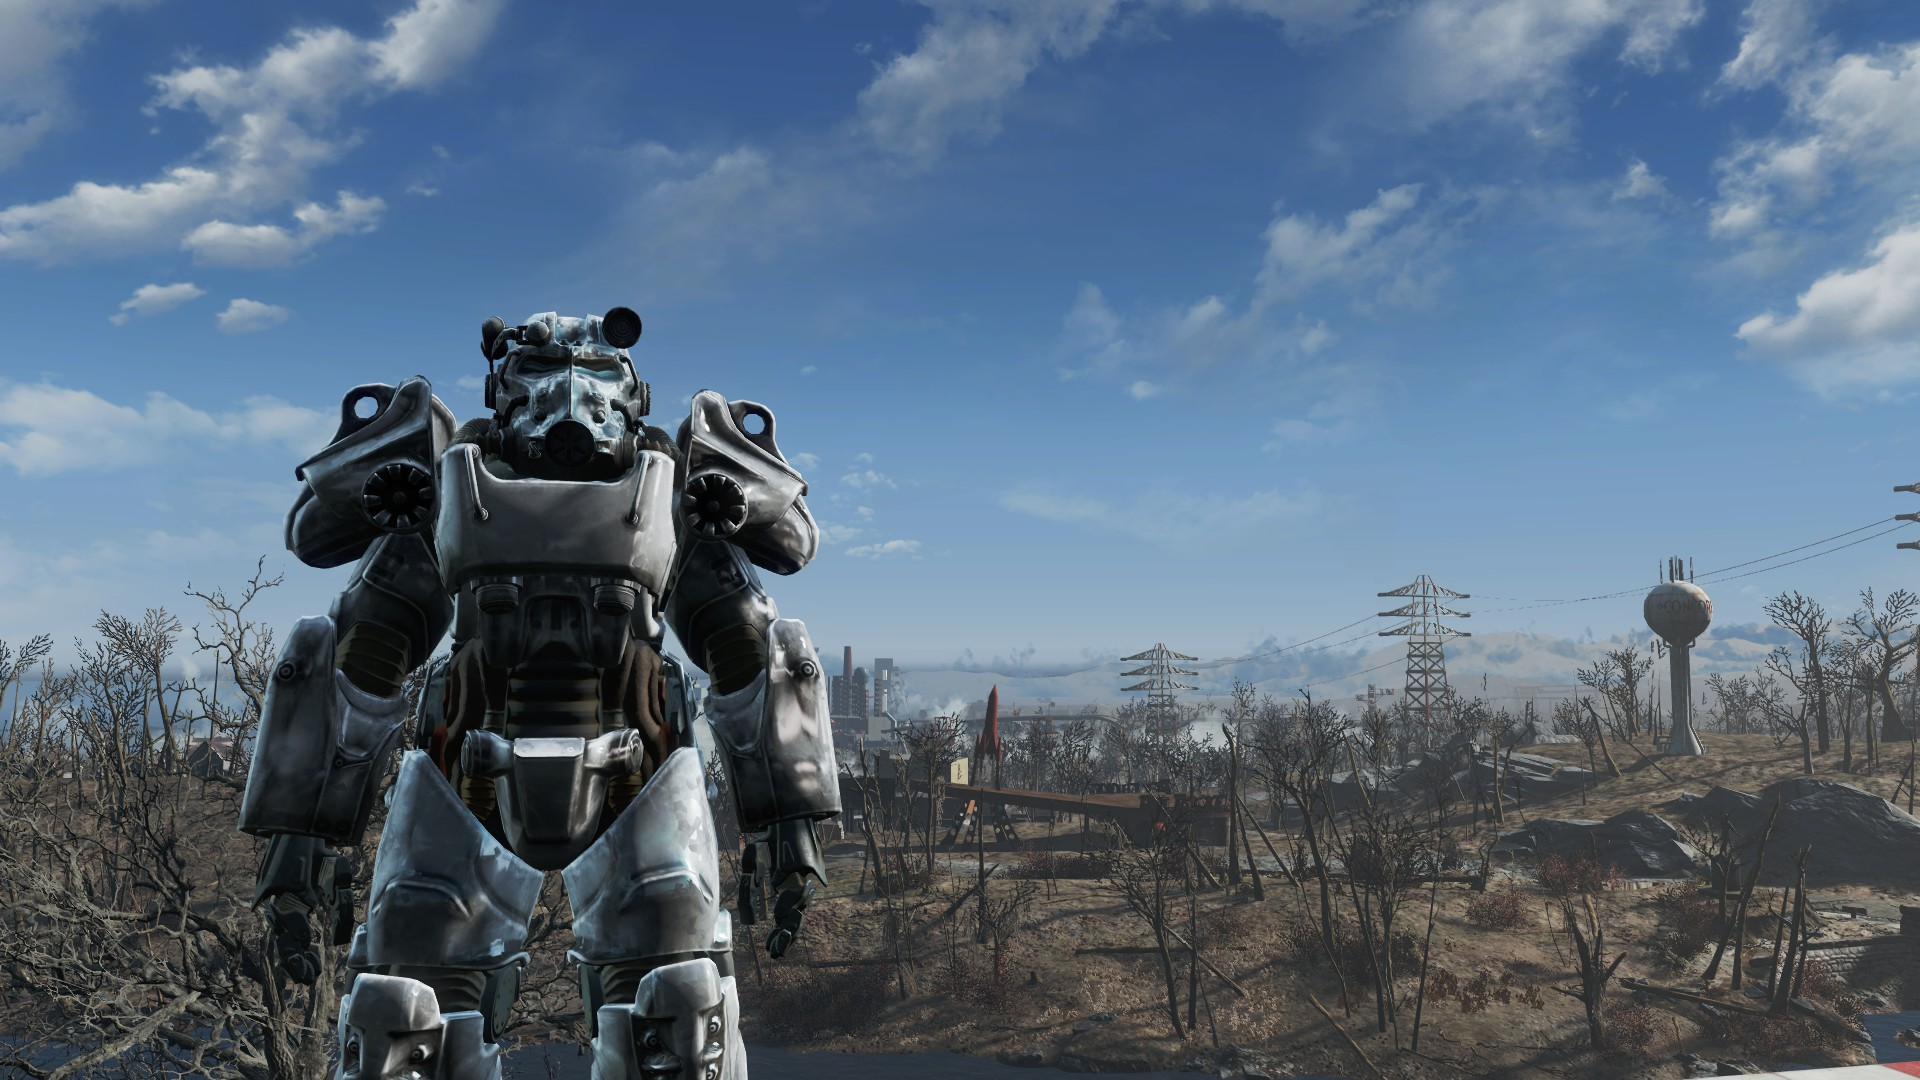 20190407205543_1.jpg - Fallout 4